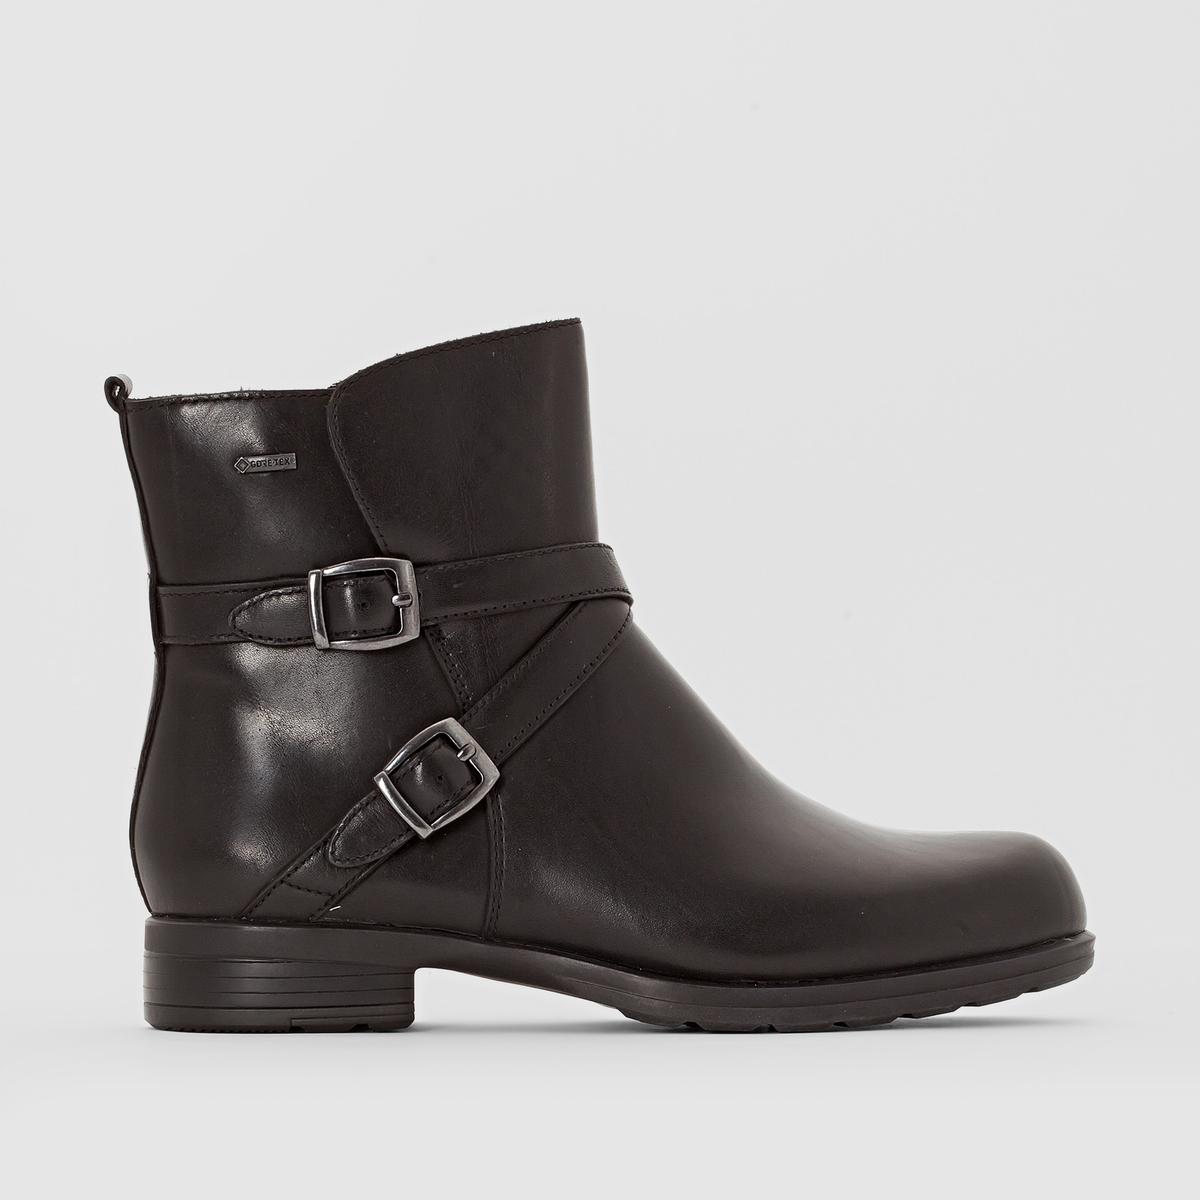 Ботинки кожаные Chesthuntbe